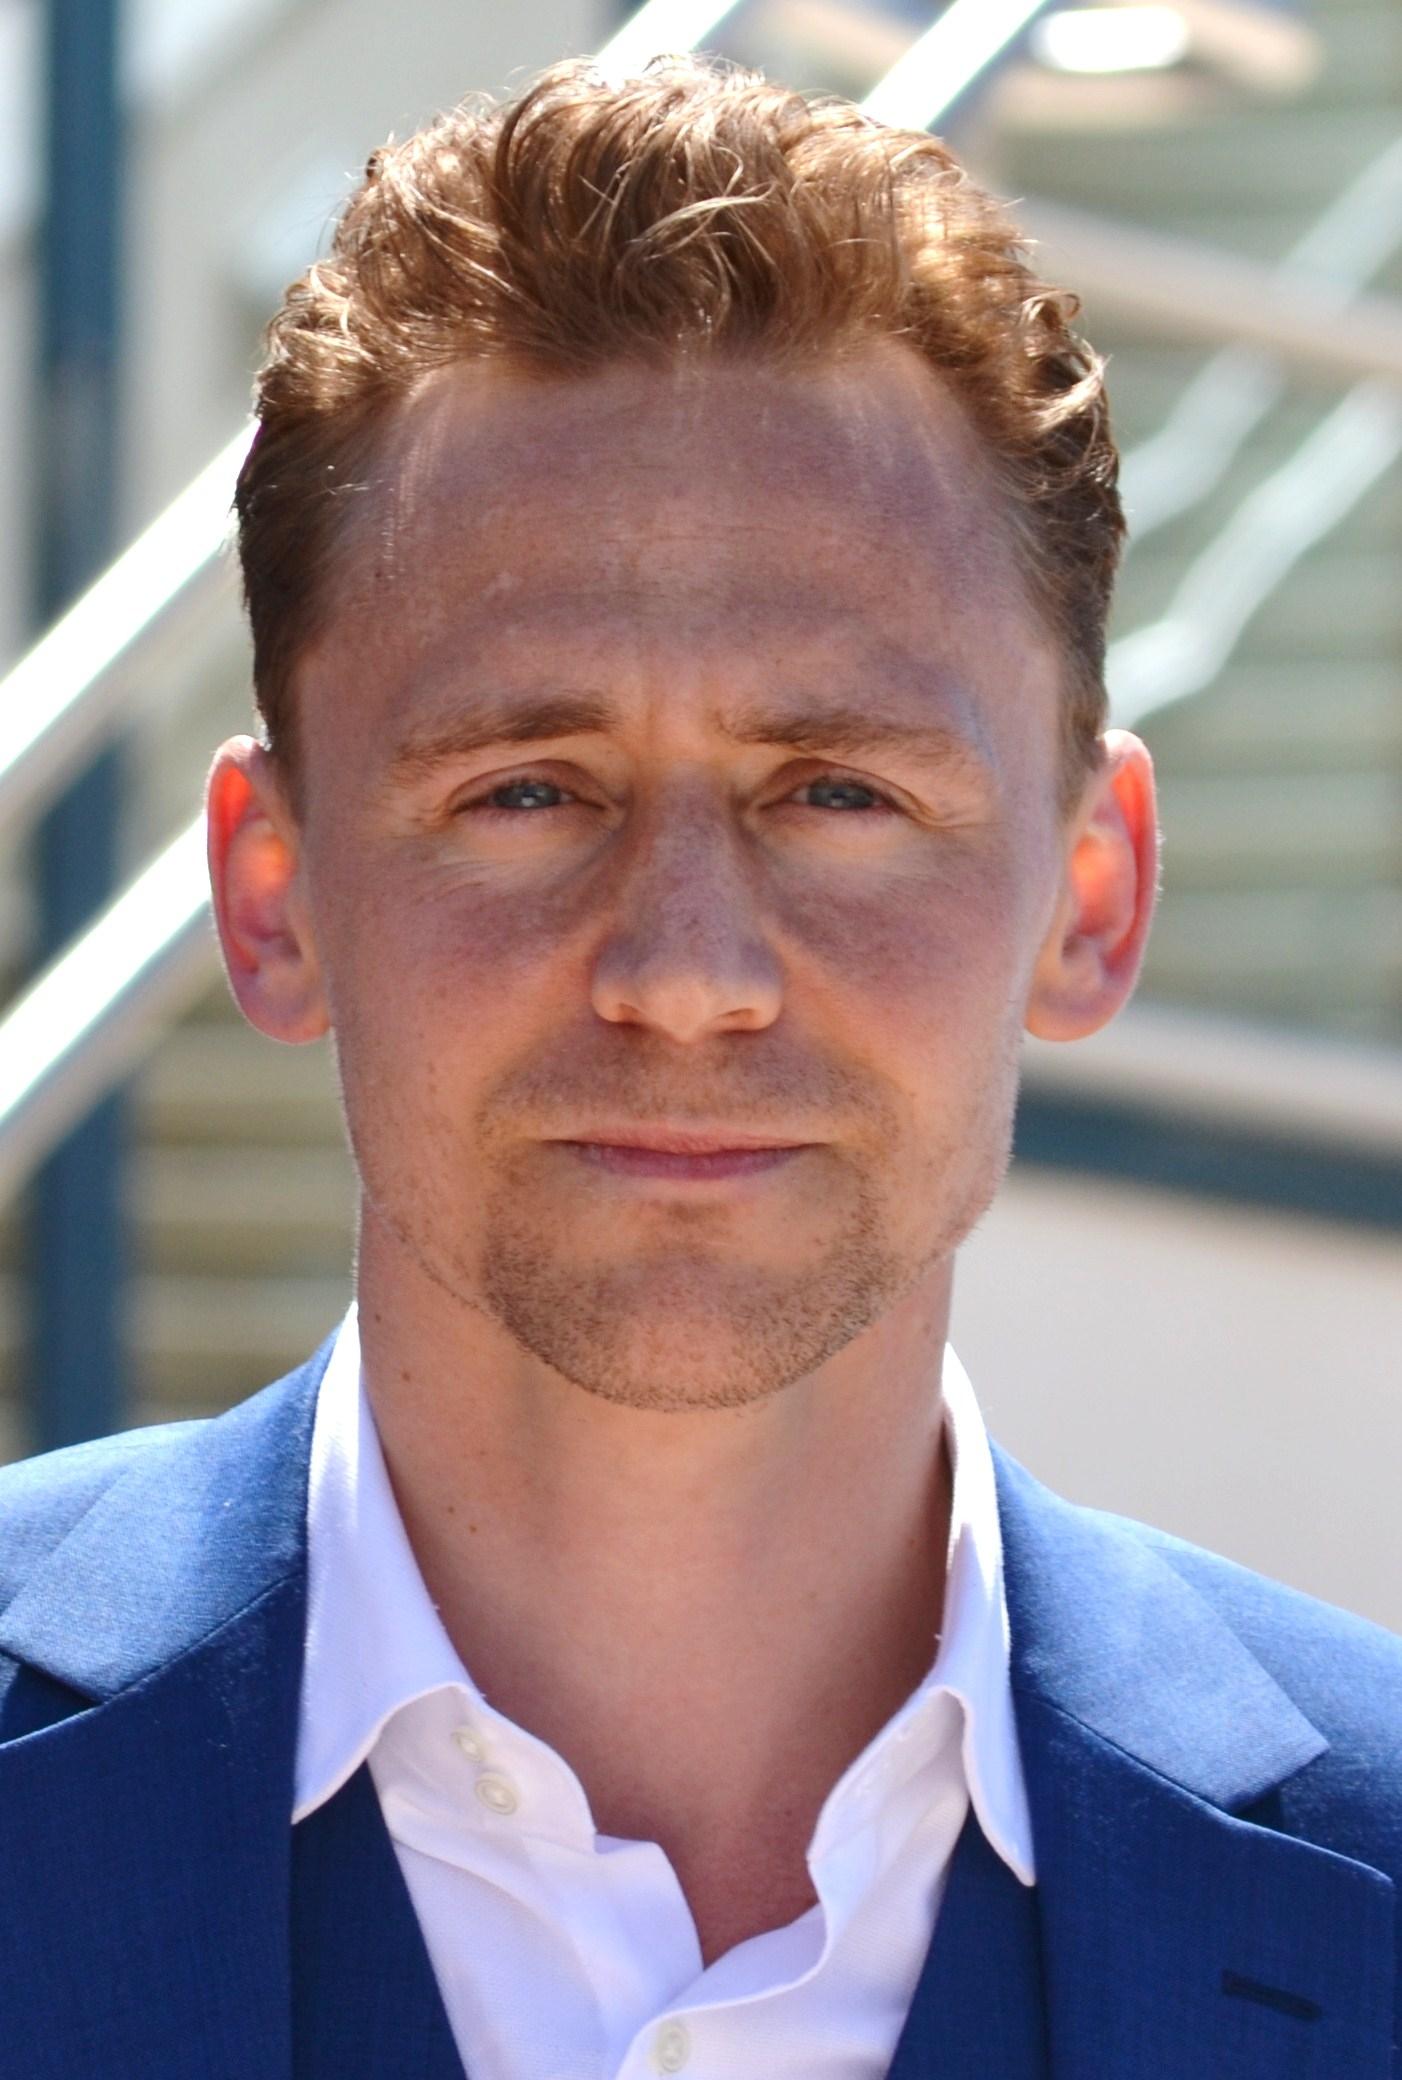 Tom Hiddleston i Cannes 2013. James Bond